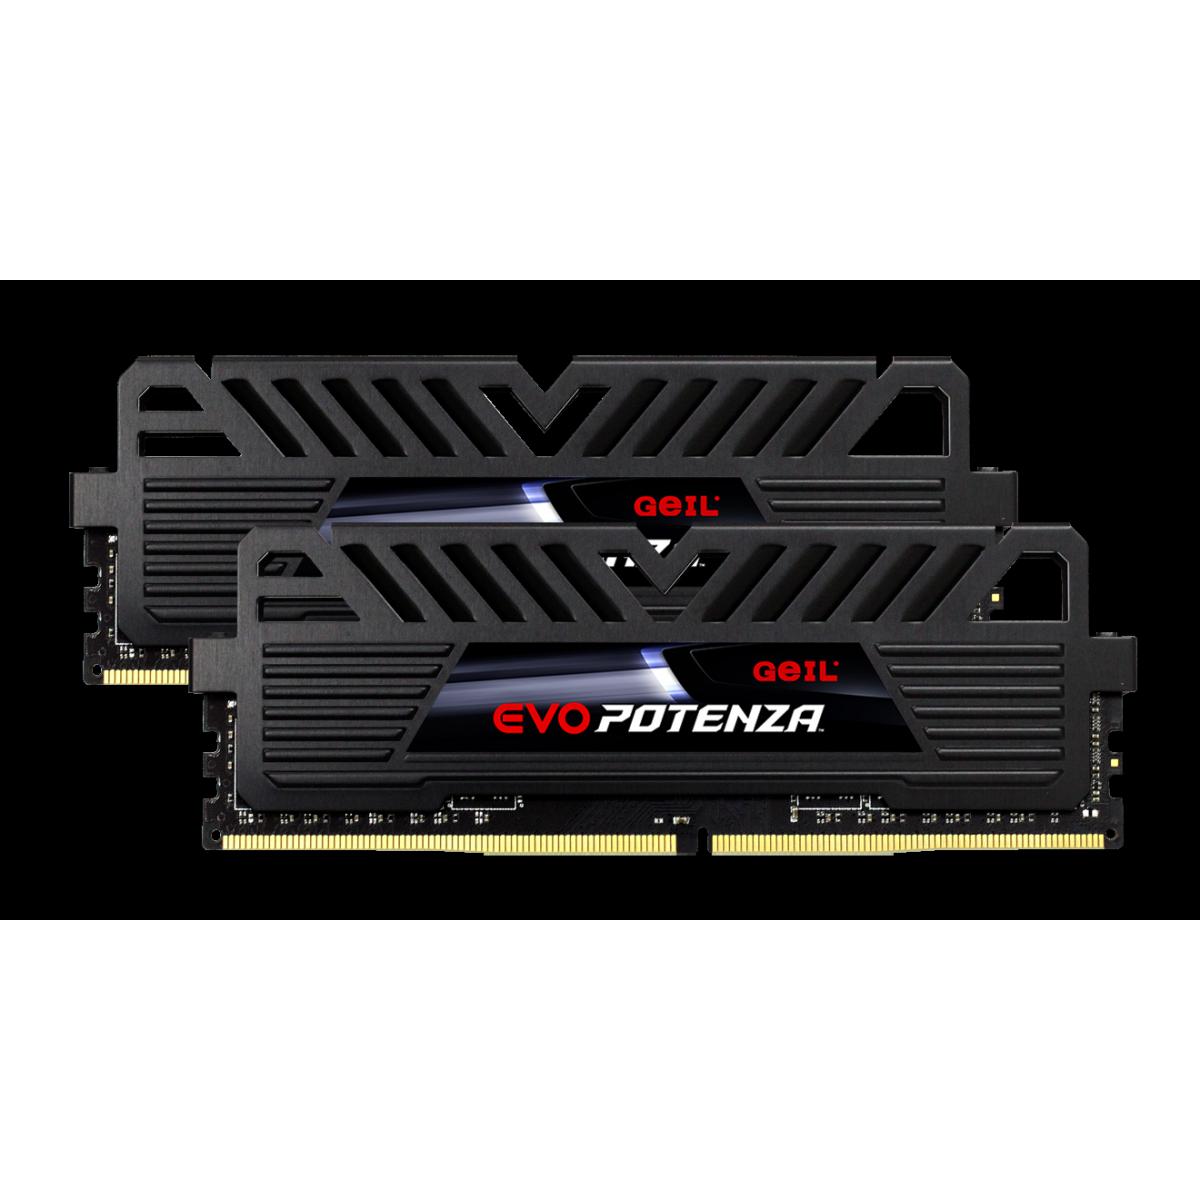 Kit Dual Channel 16GB (2x8GB) Memória DDR4 Geil Evo Potenza 3000MHz, Black